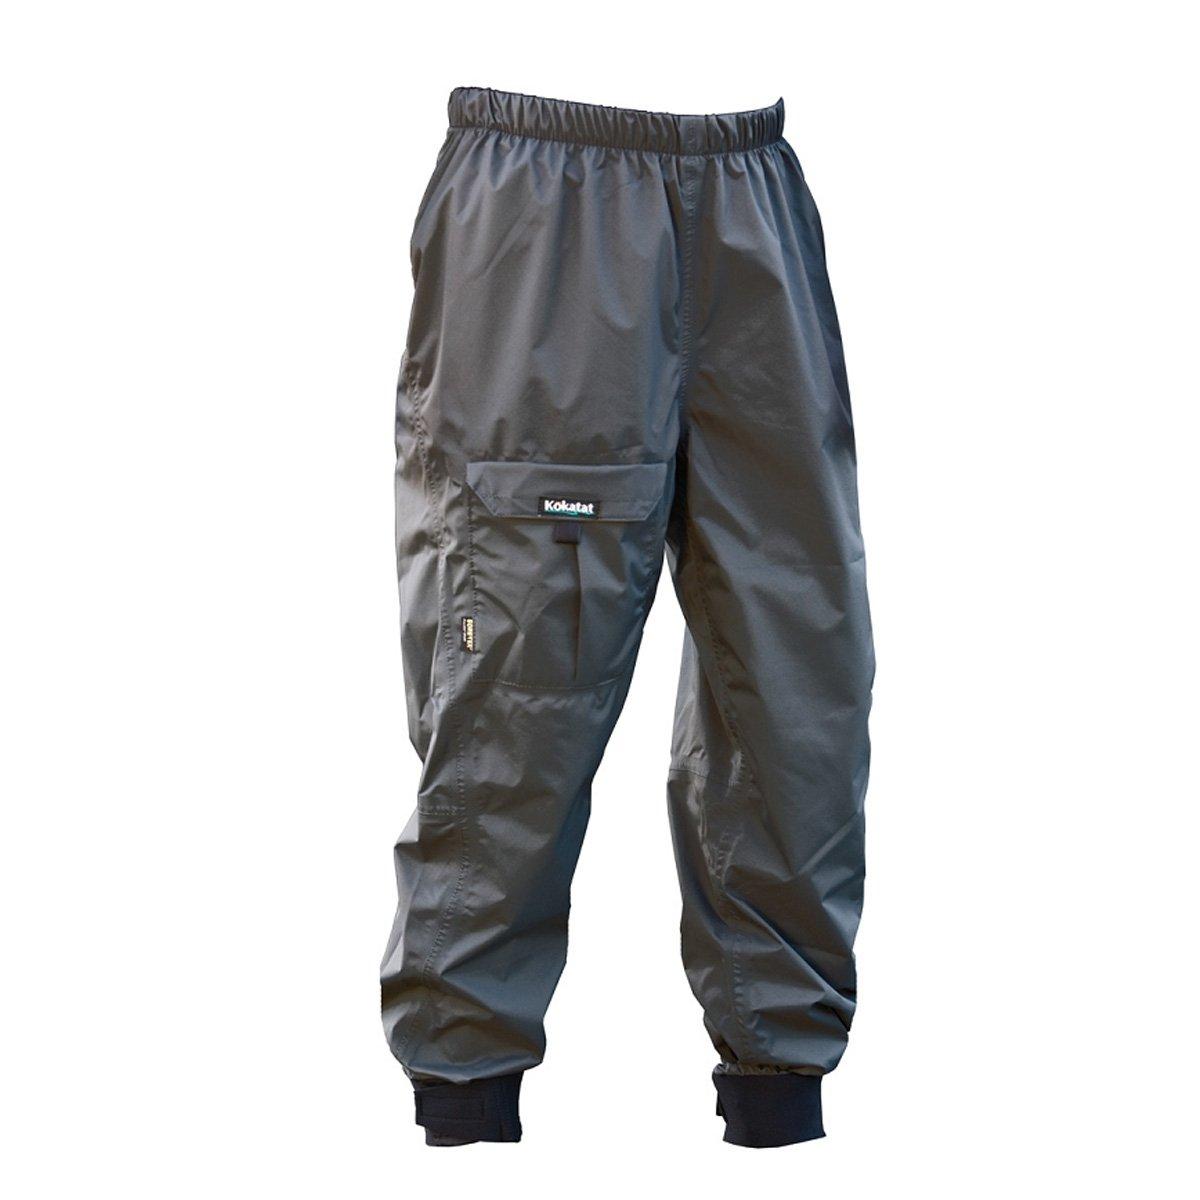 Kokatat Women's GORE-TEX PacLite Boater Pants-Gray-L